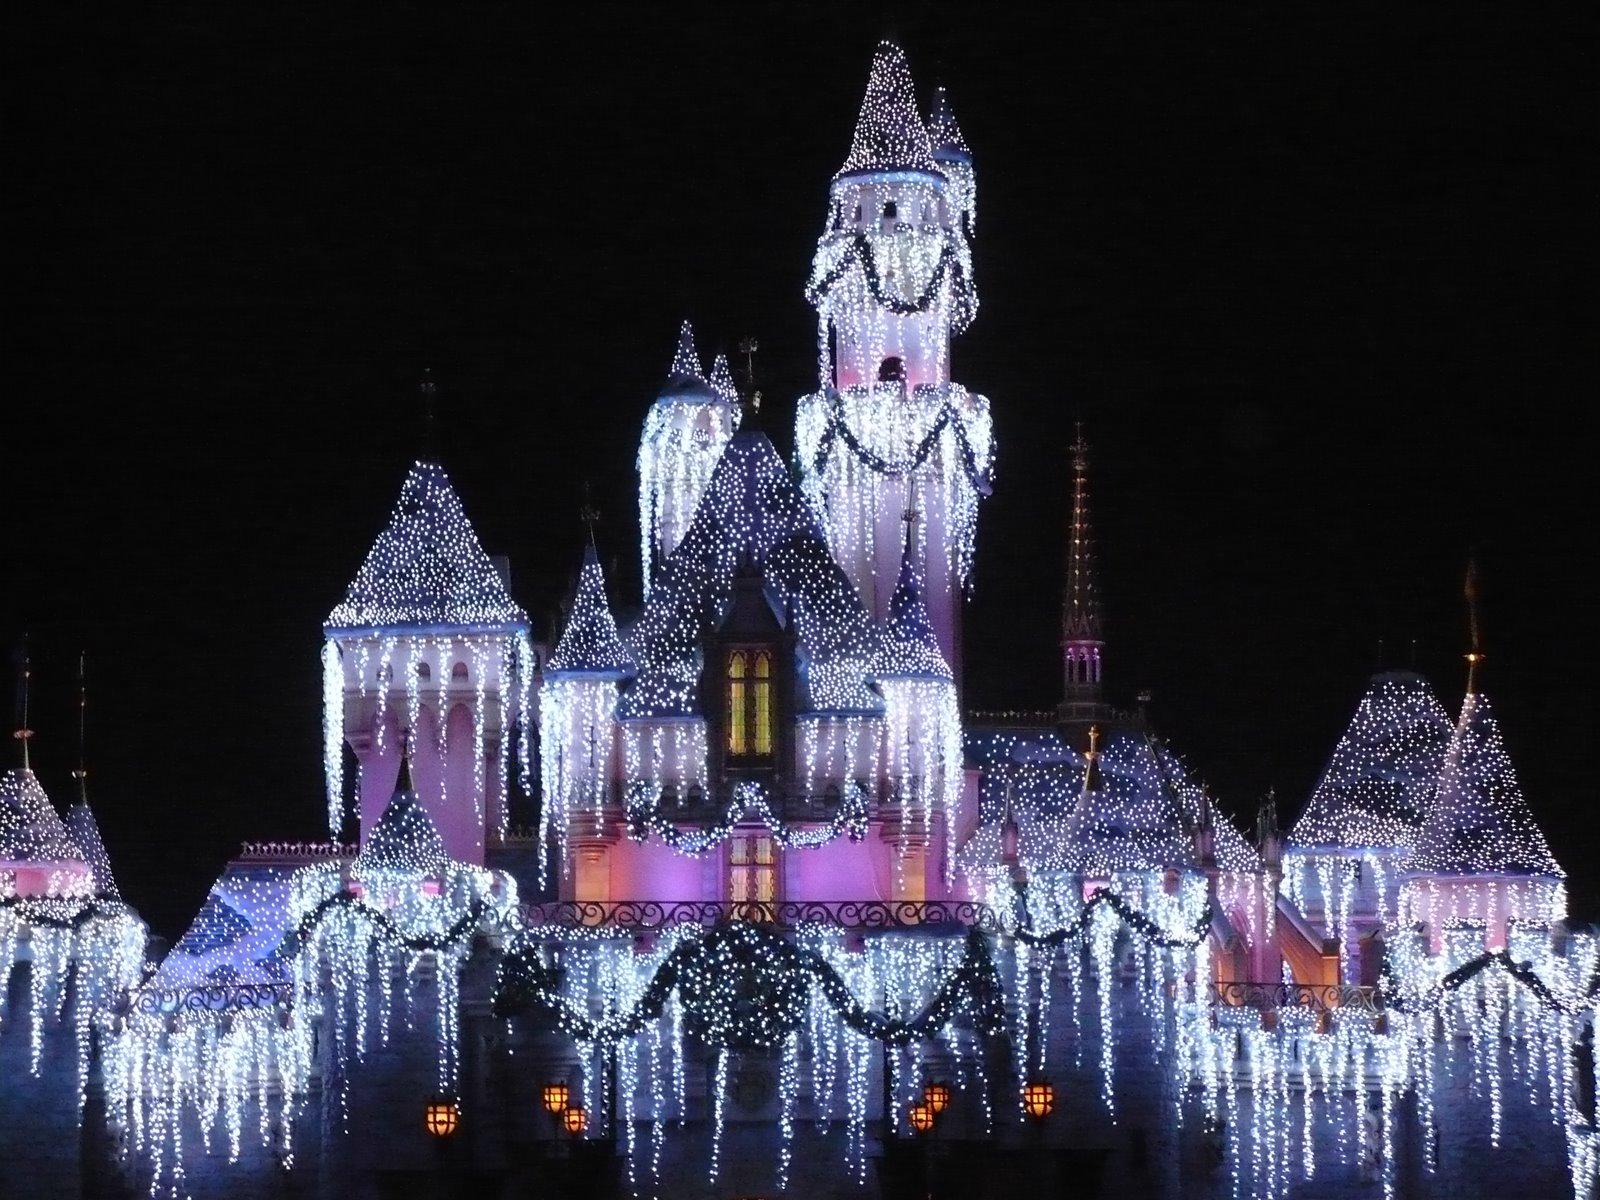 image - disneyland-christmas-castle-hd-wallpapers | christmas